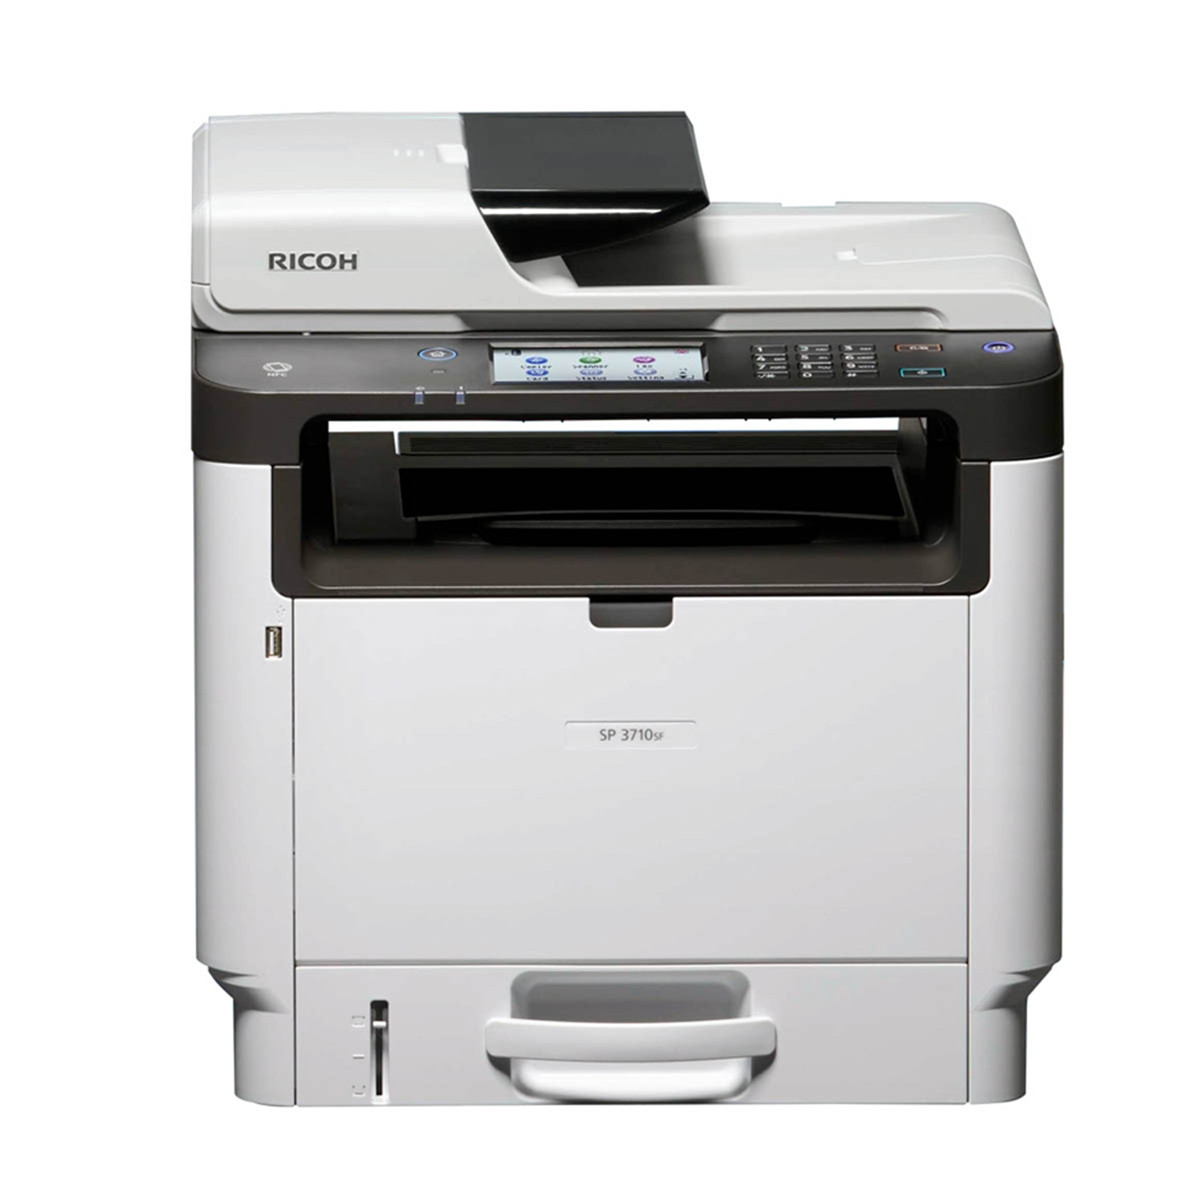 Impressora Ricoh SP 3710SF | Multifuncional Laser Monocromática